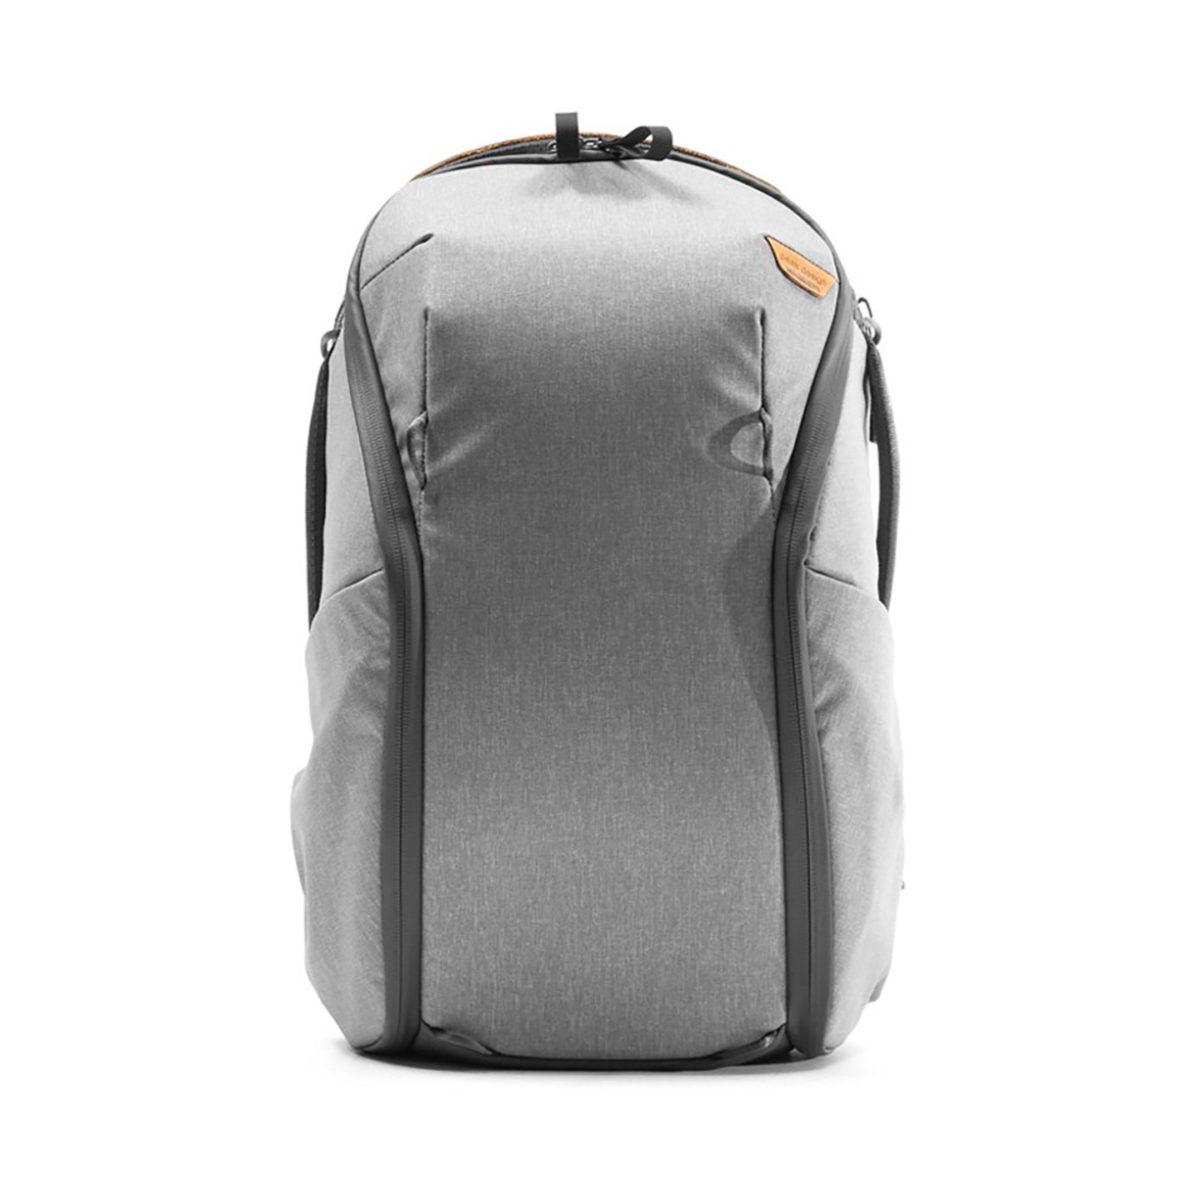 peak_design_everyday_backpack_zip_v2_15l_as_01